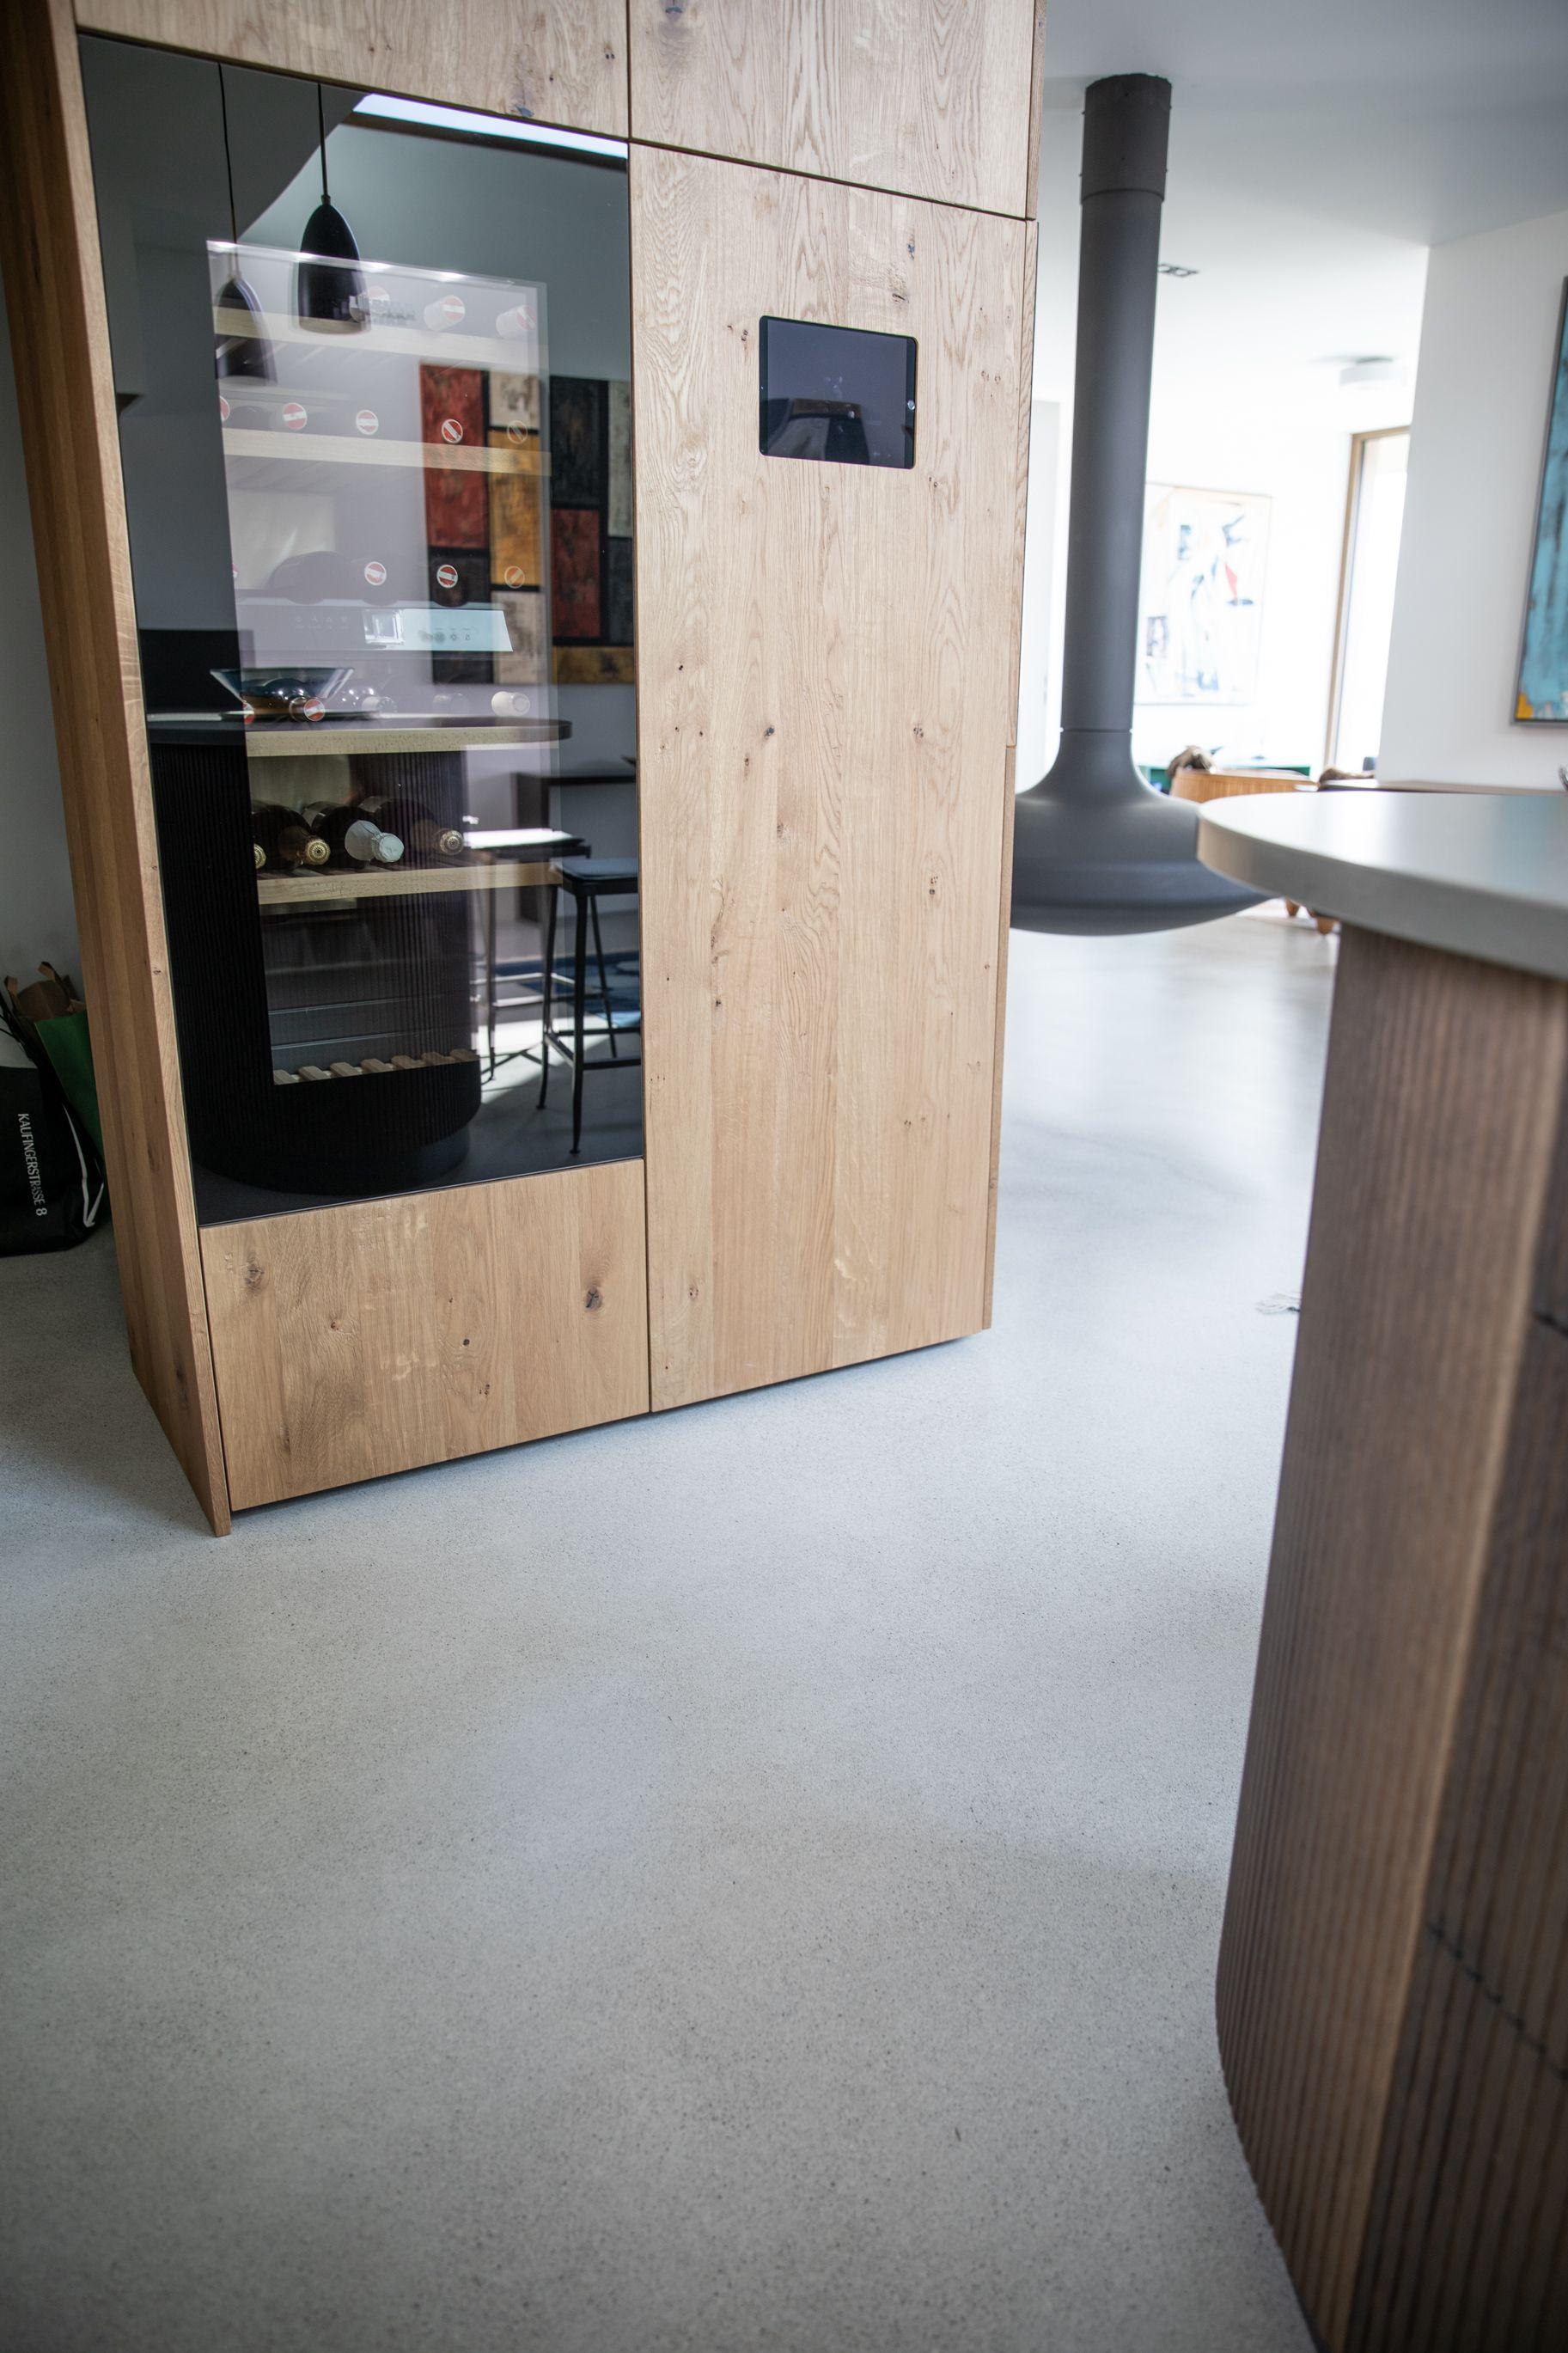 Küchen Bodenbelag   Küchen bodenbelag, Küchenboden, Fußböden